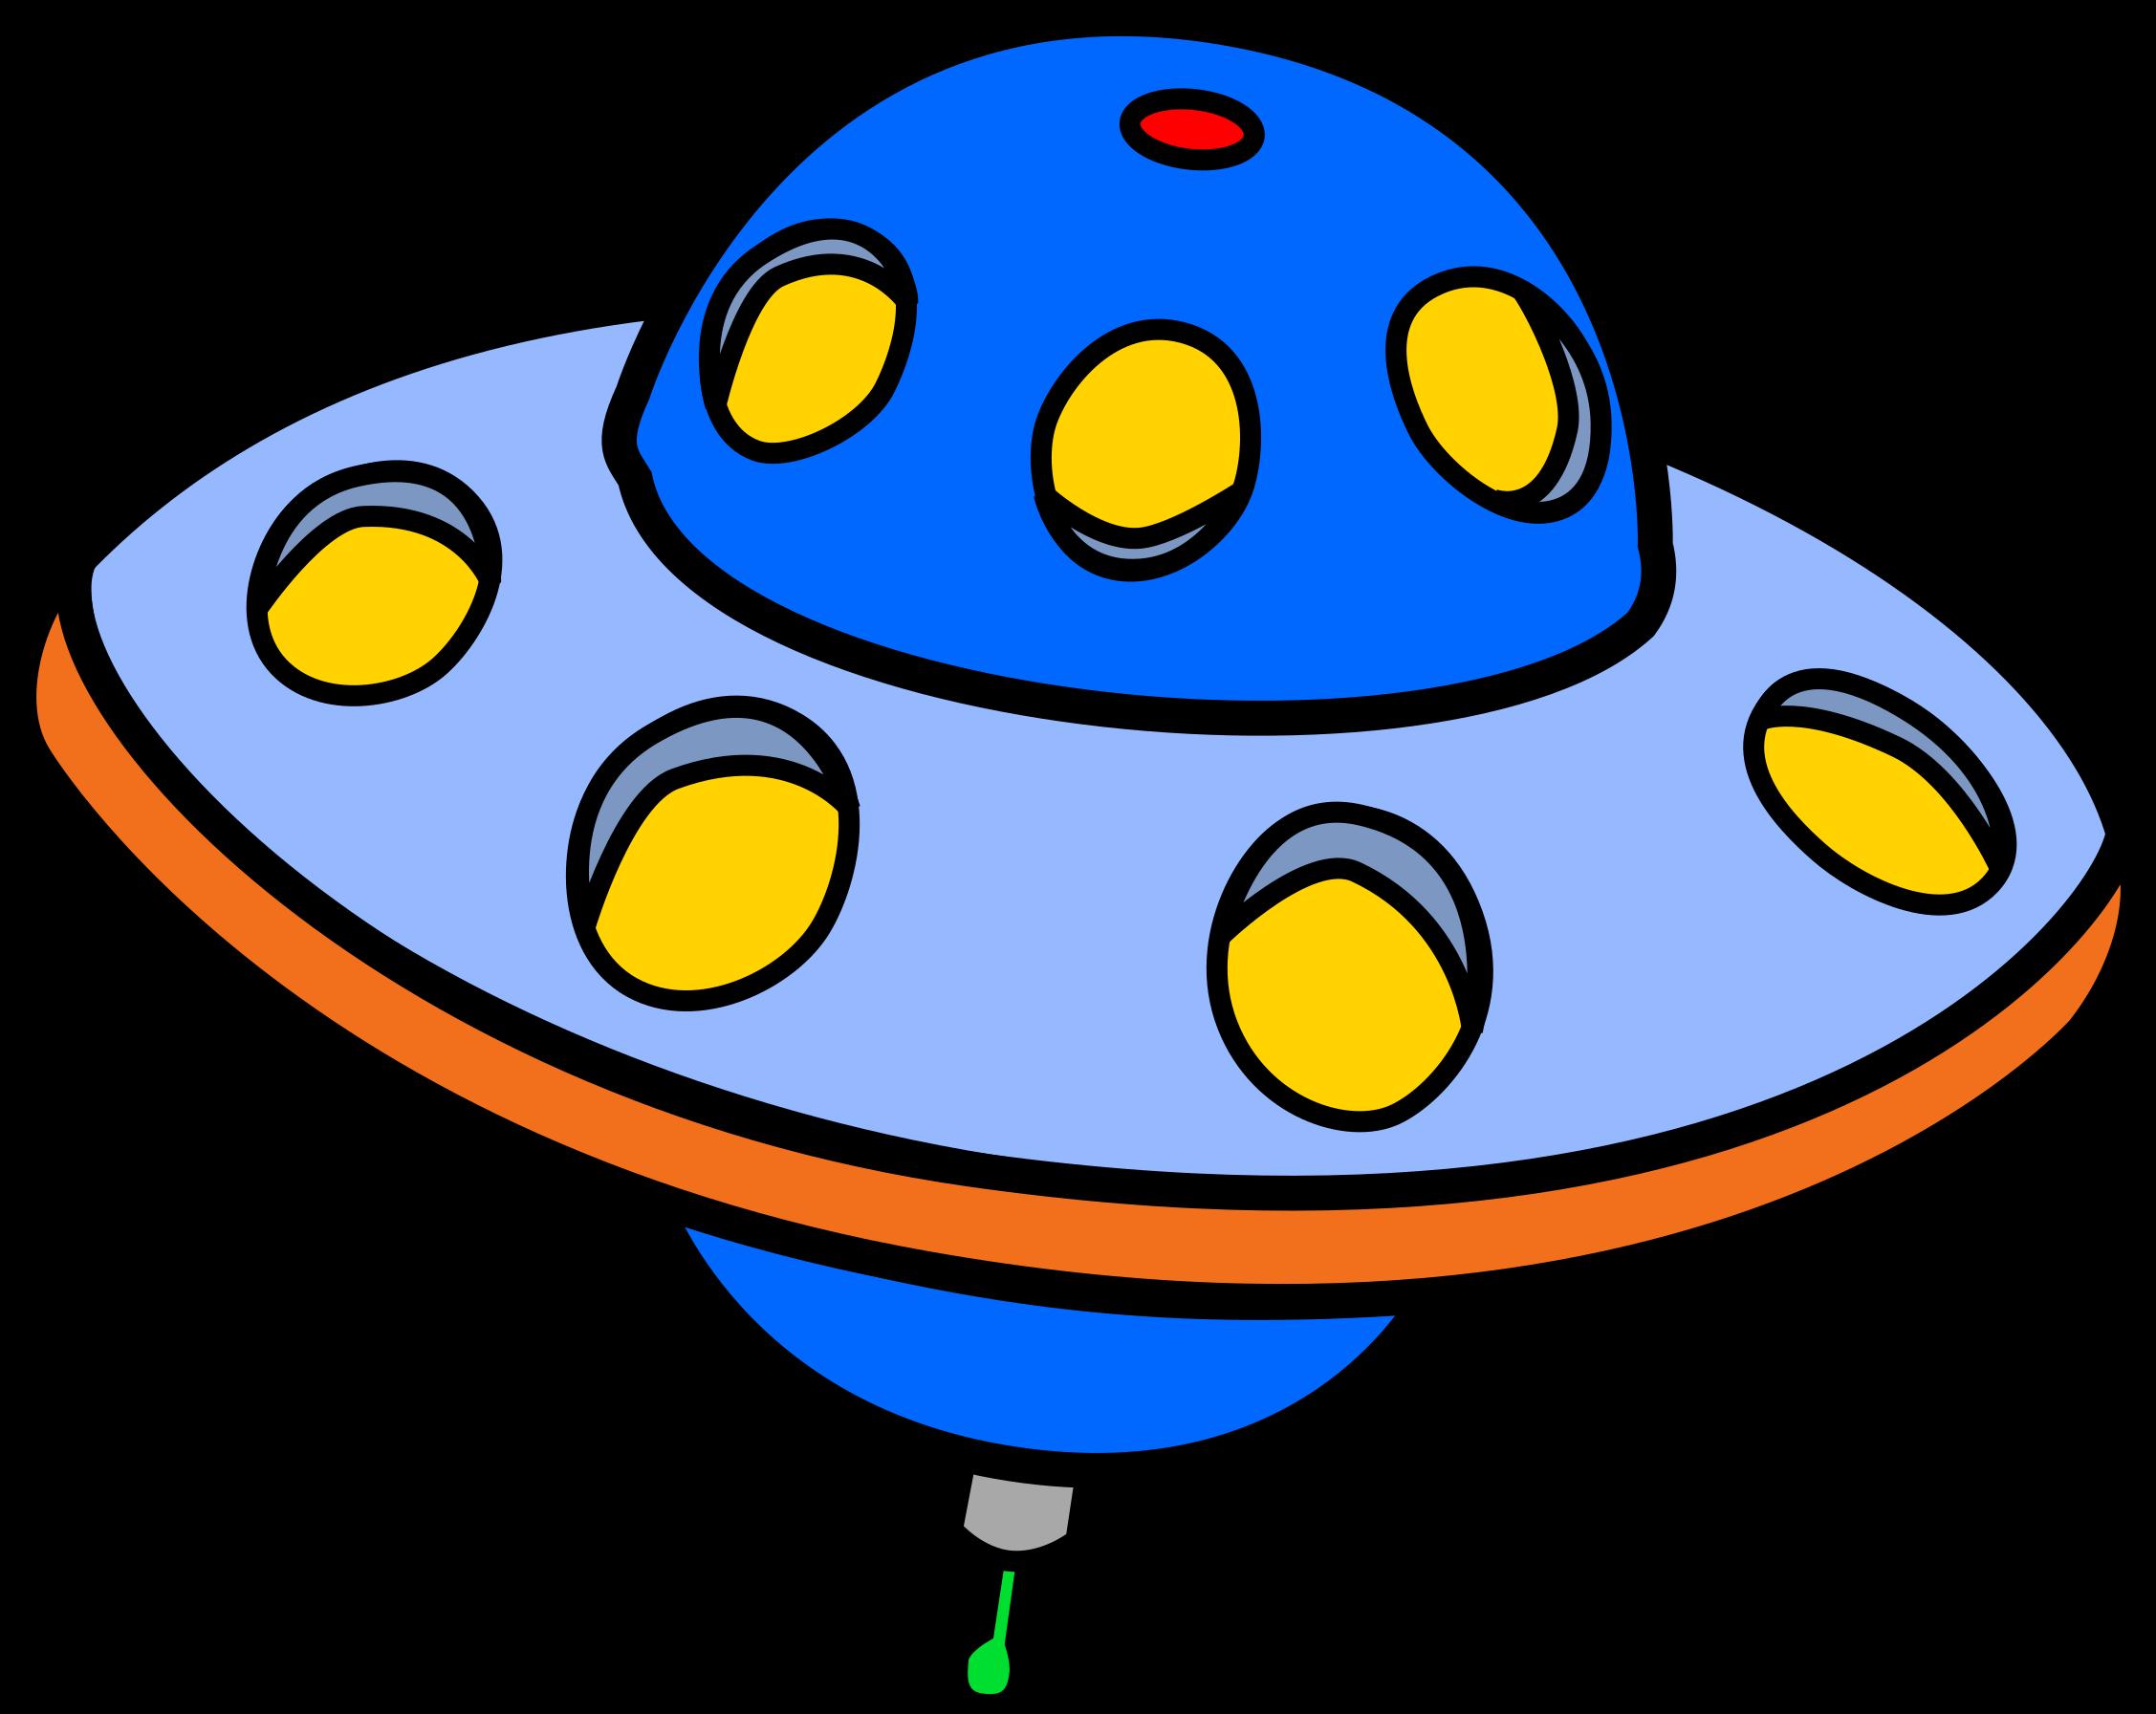 картинки космических тарелок оказалась